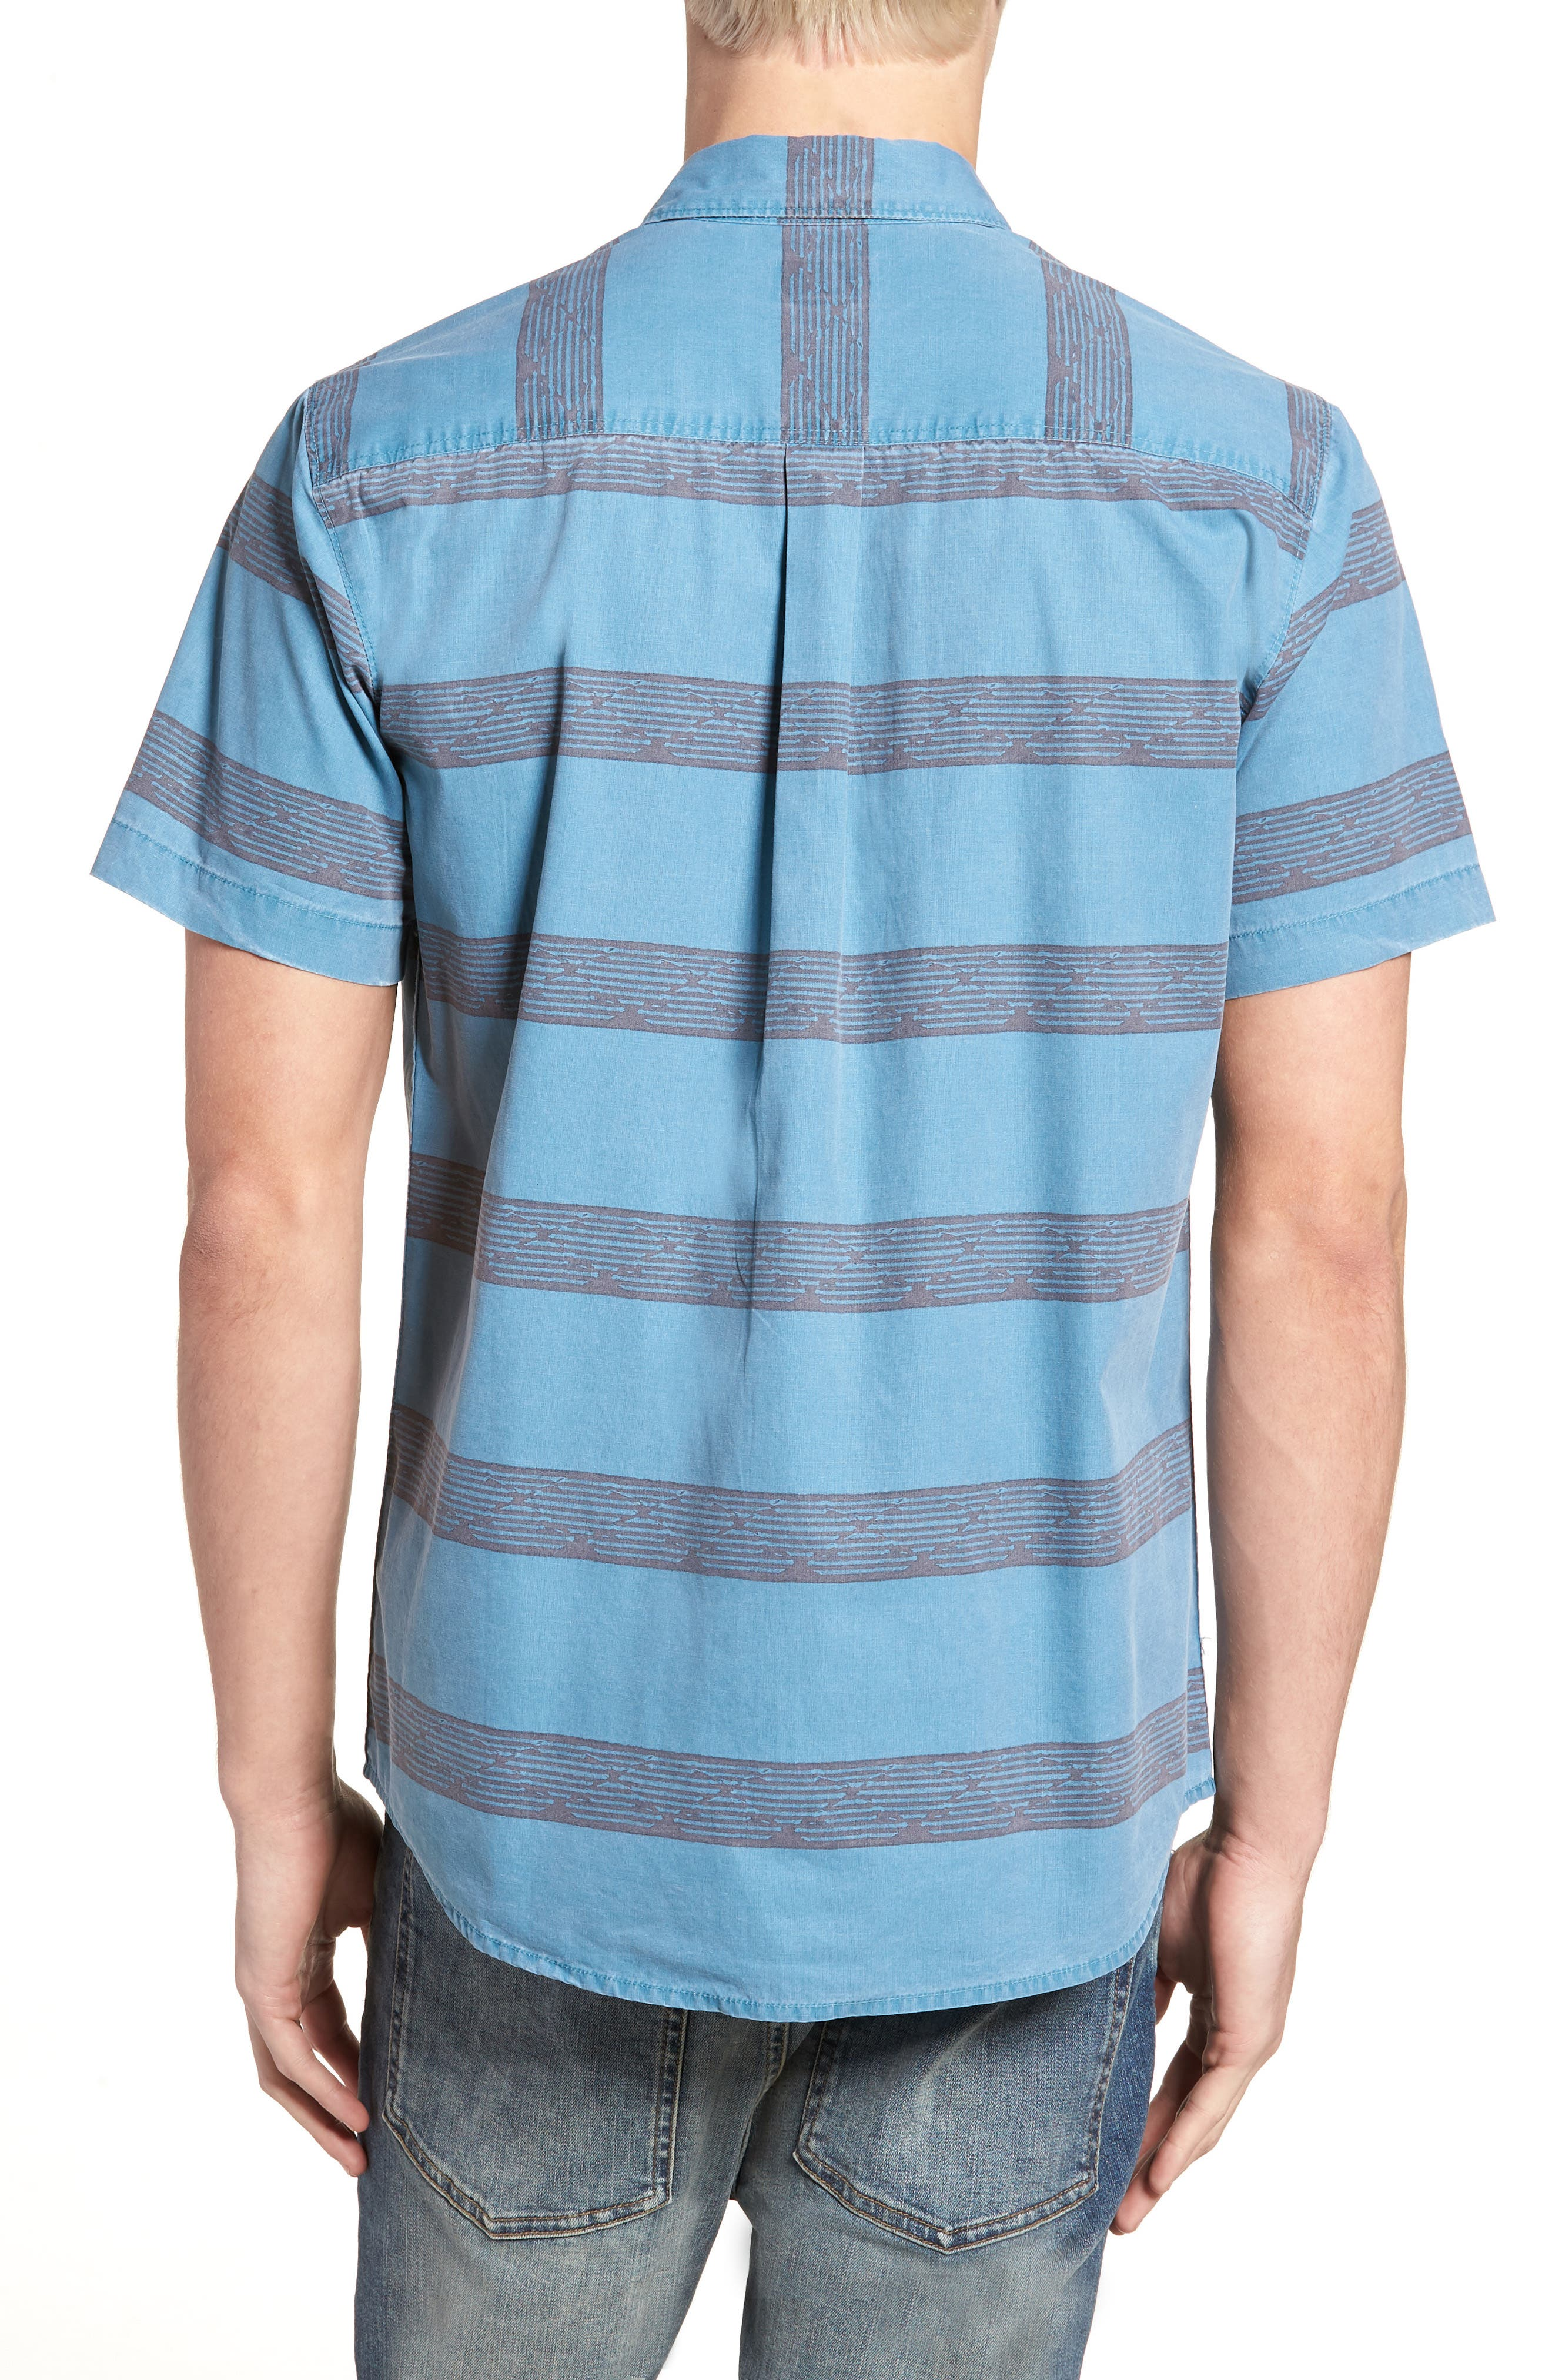 Wagner Woven Shirt,                             Alternate thumbnail 2, color,                             DEEP TEAL